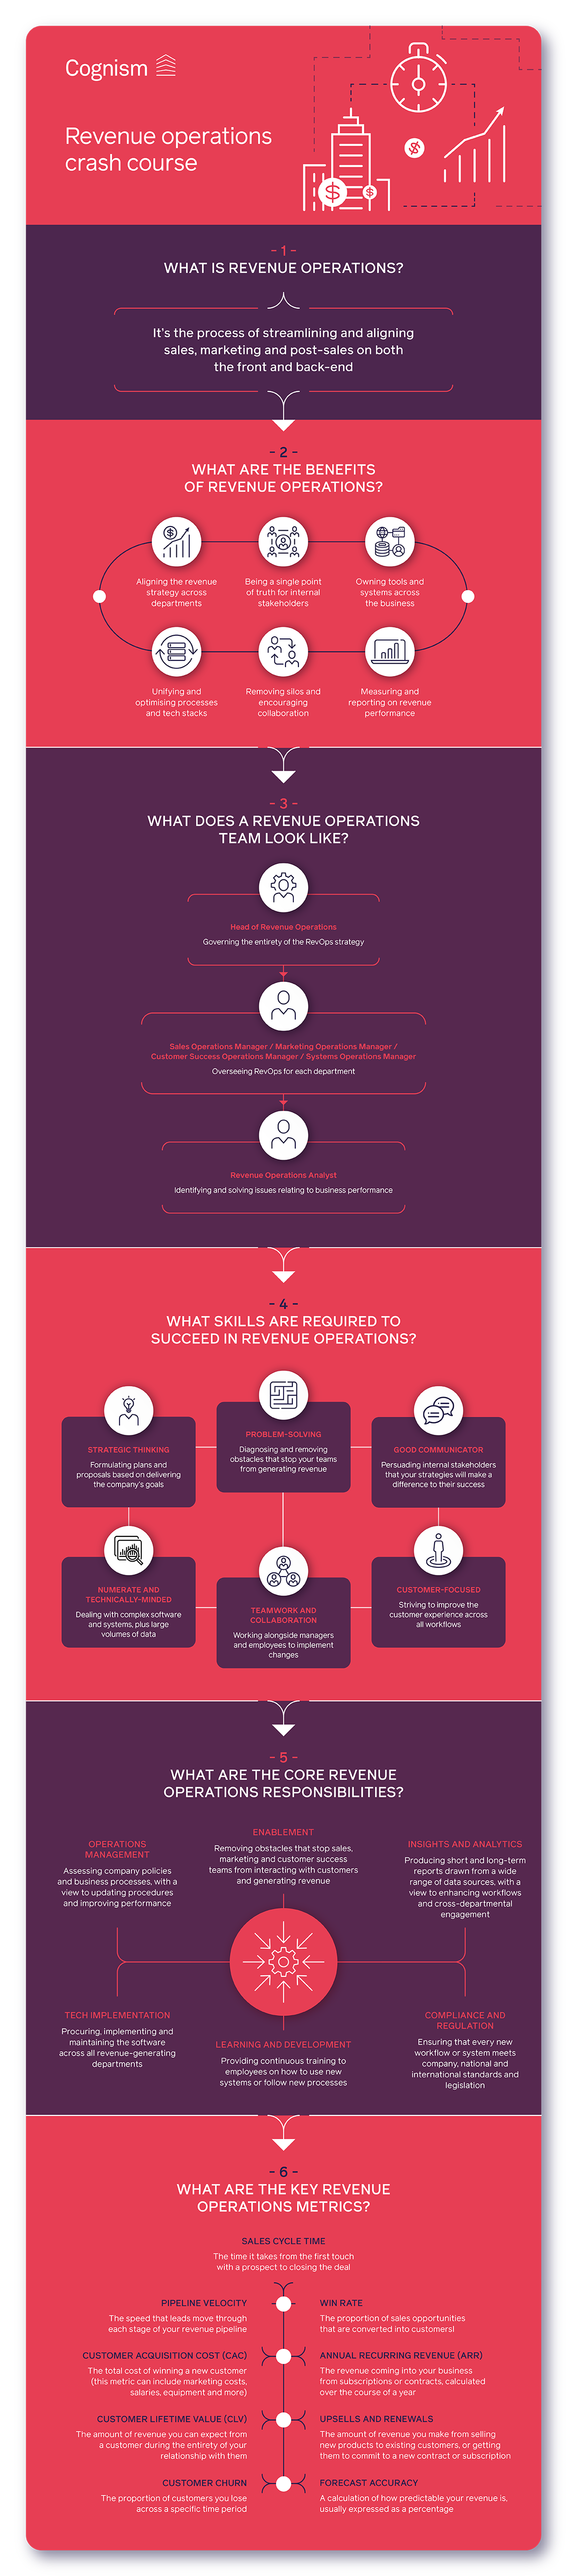 revenue-operations-infographic